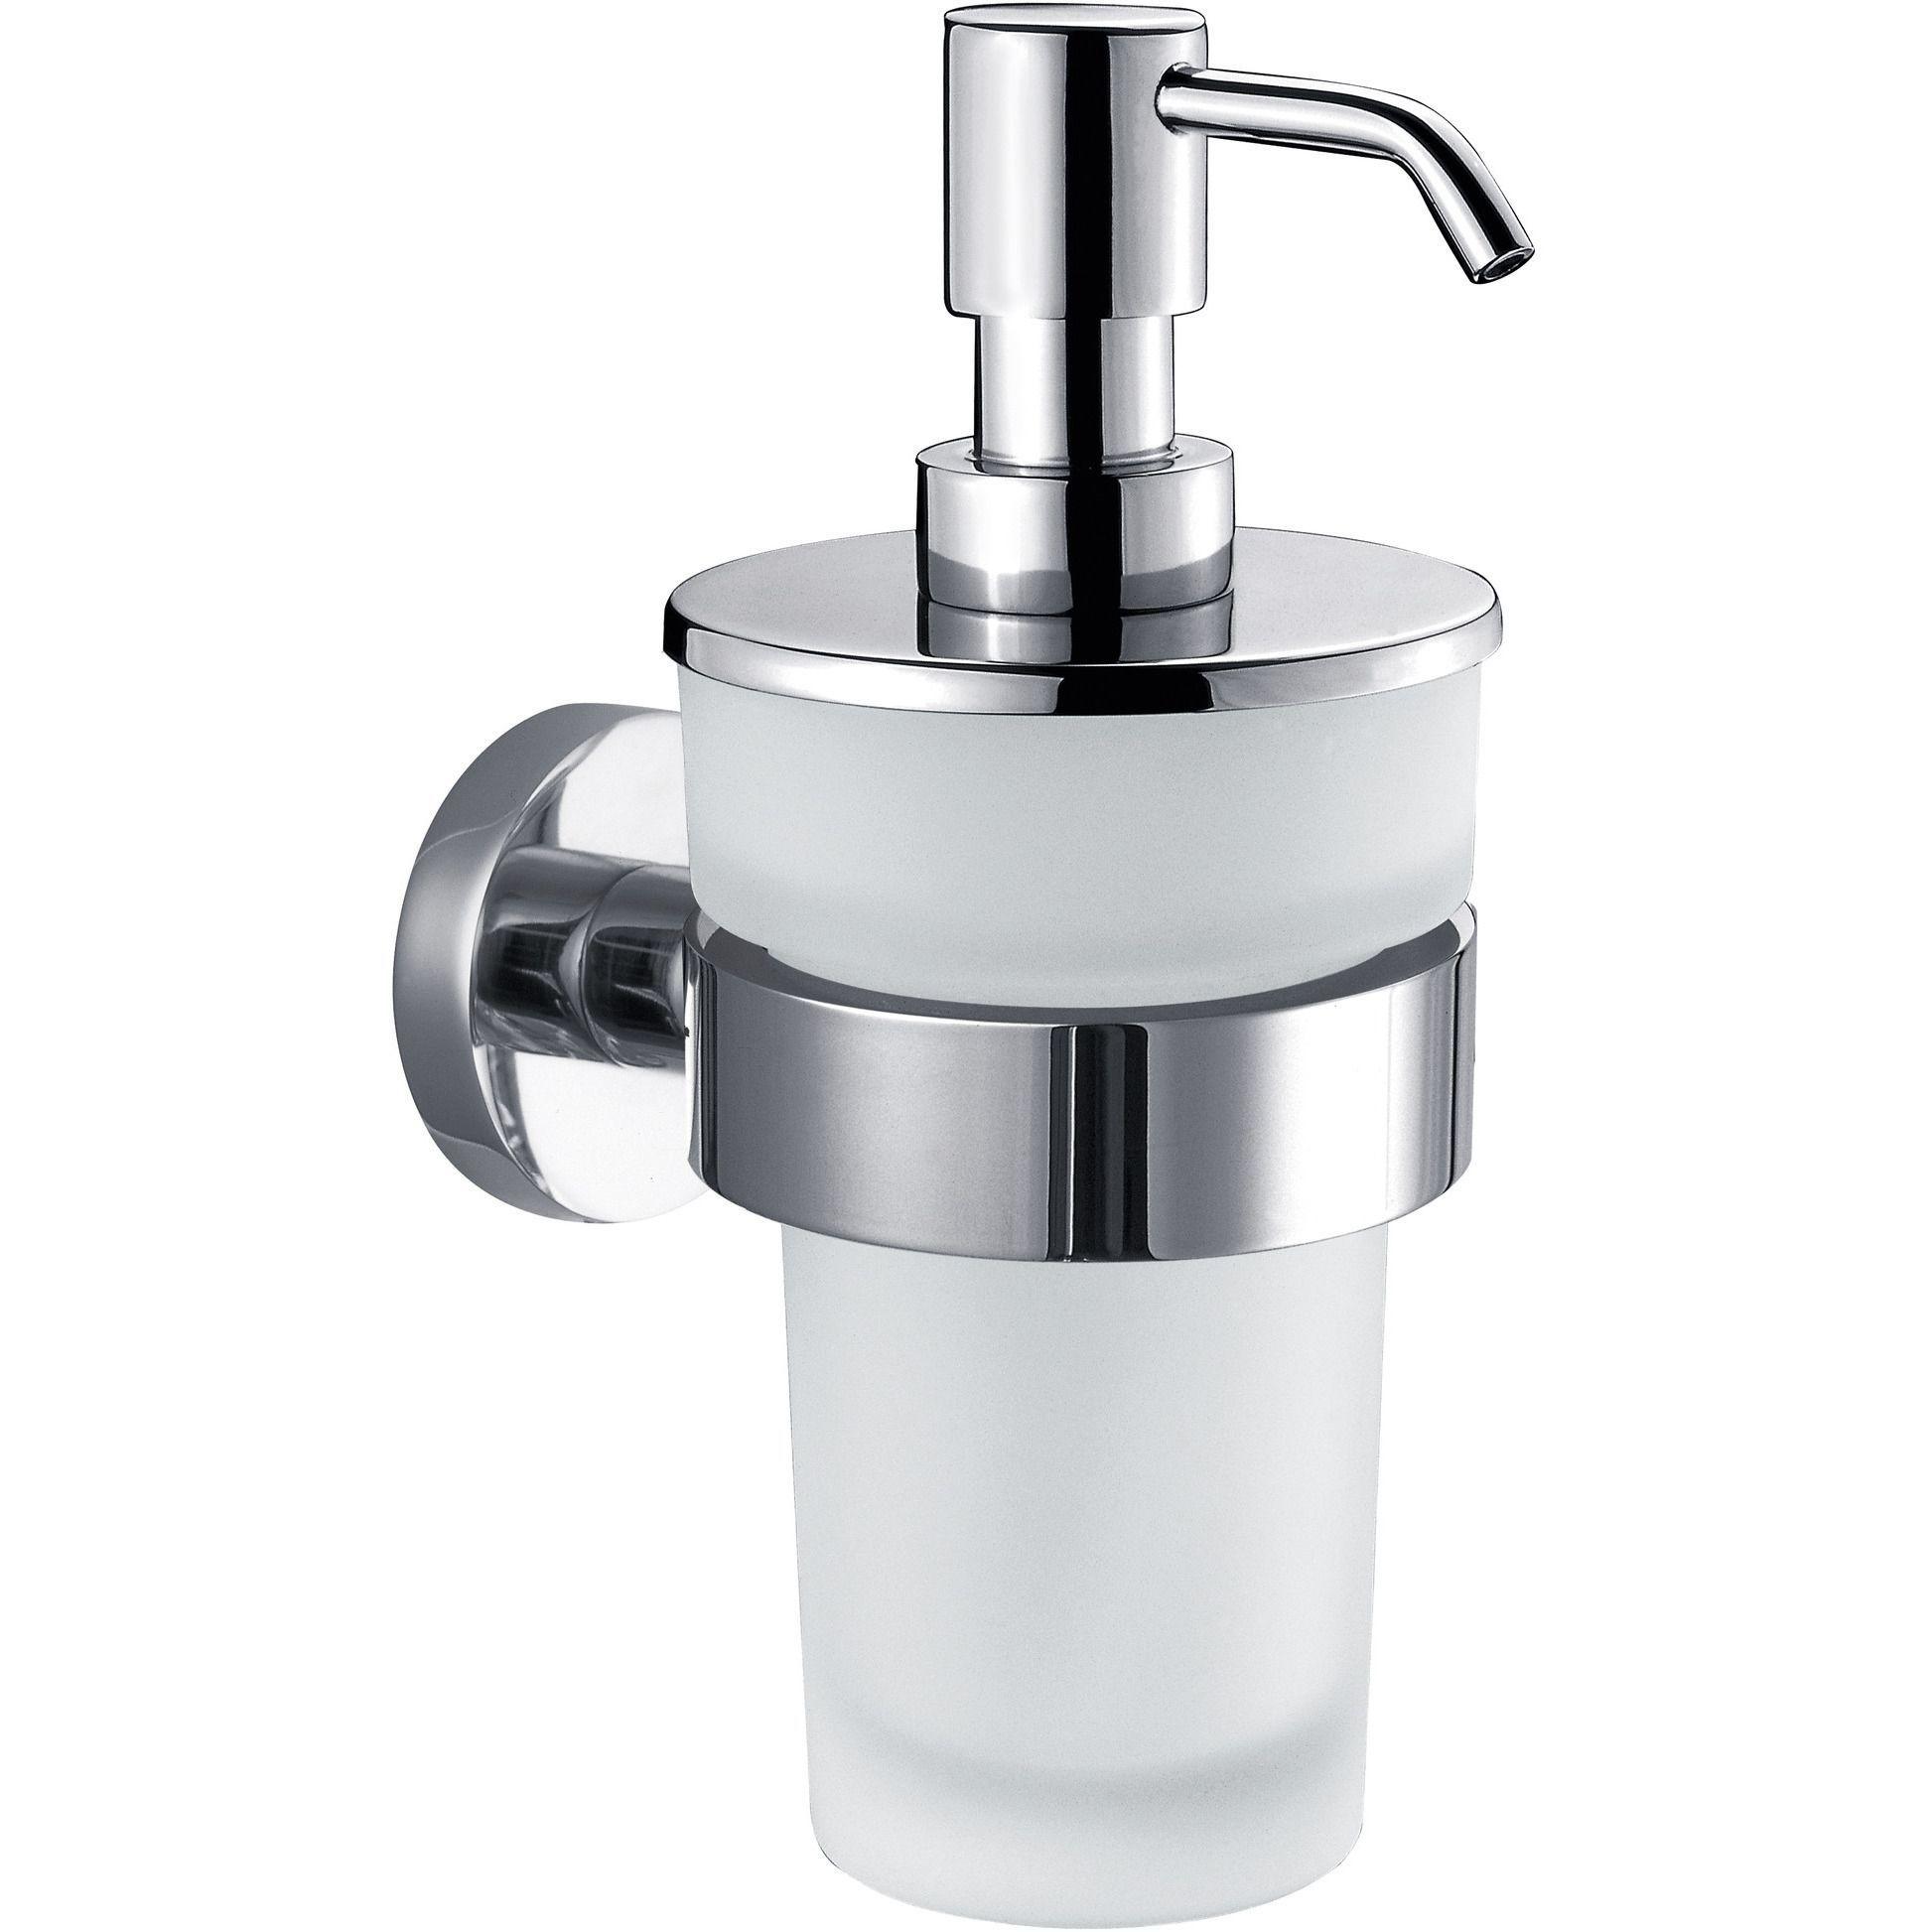 DWBA Glass Soap Lotion Dispenser Pump for Kitchen/ Bathroom Wall Mounted. Chrome